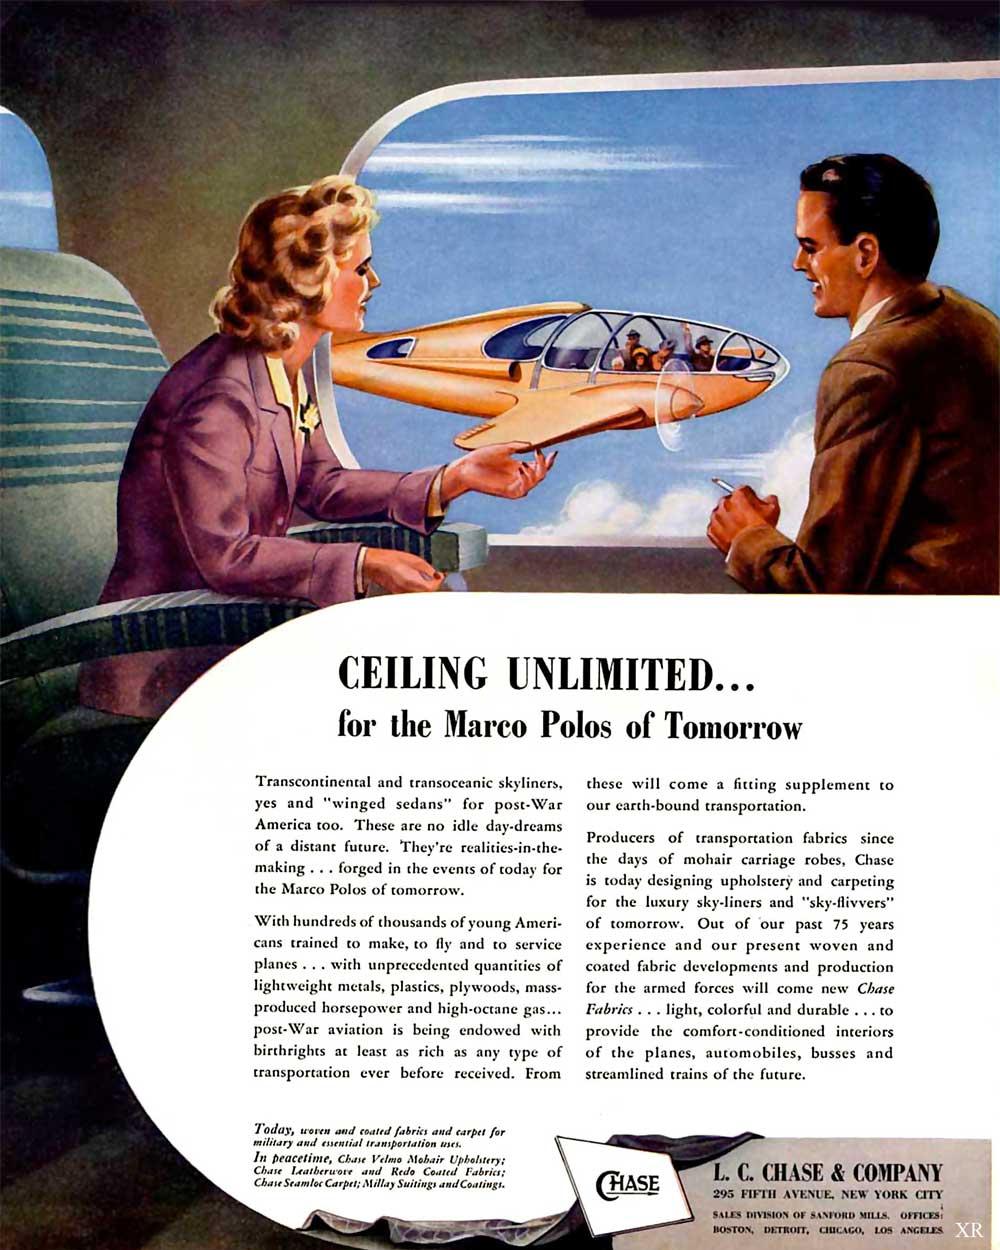 Retro-futurism in 1940s